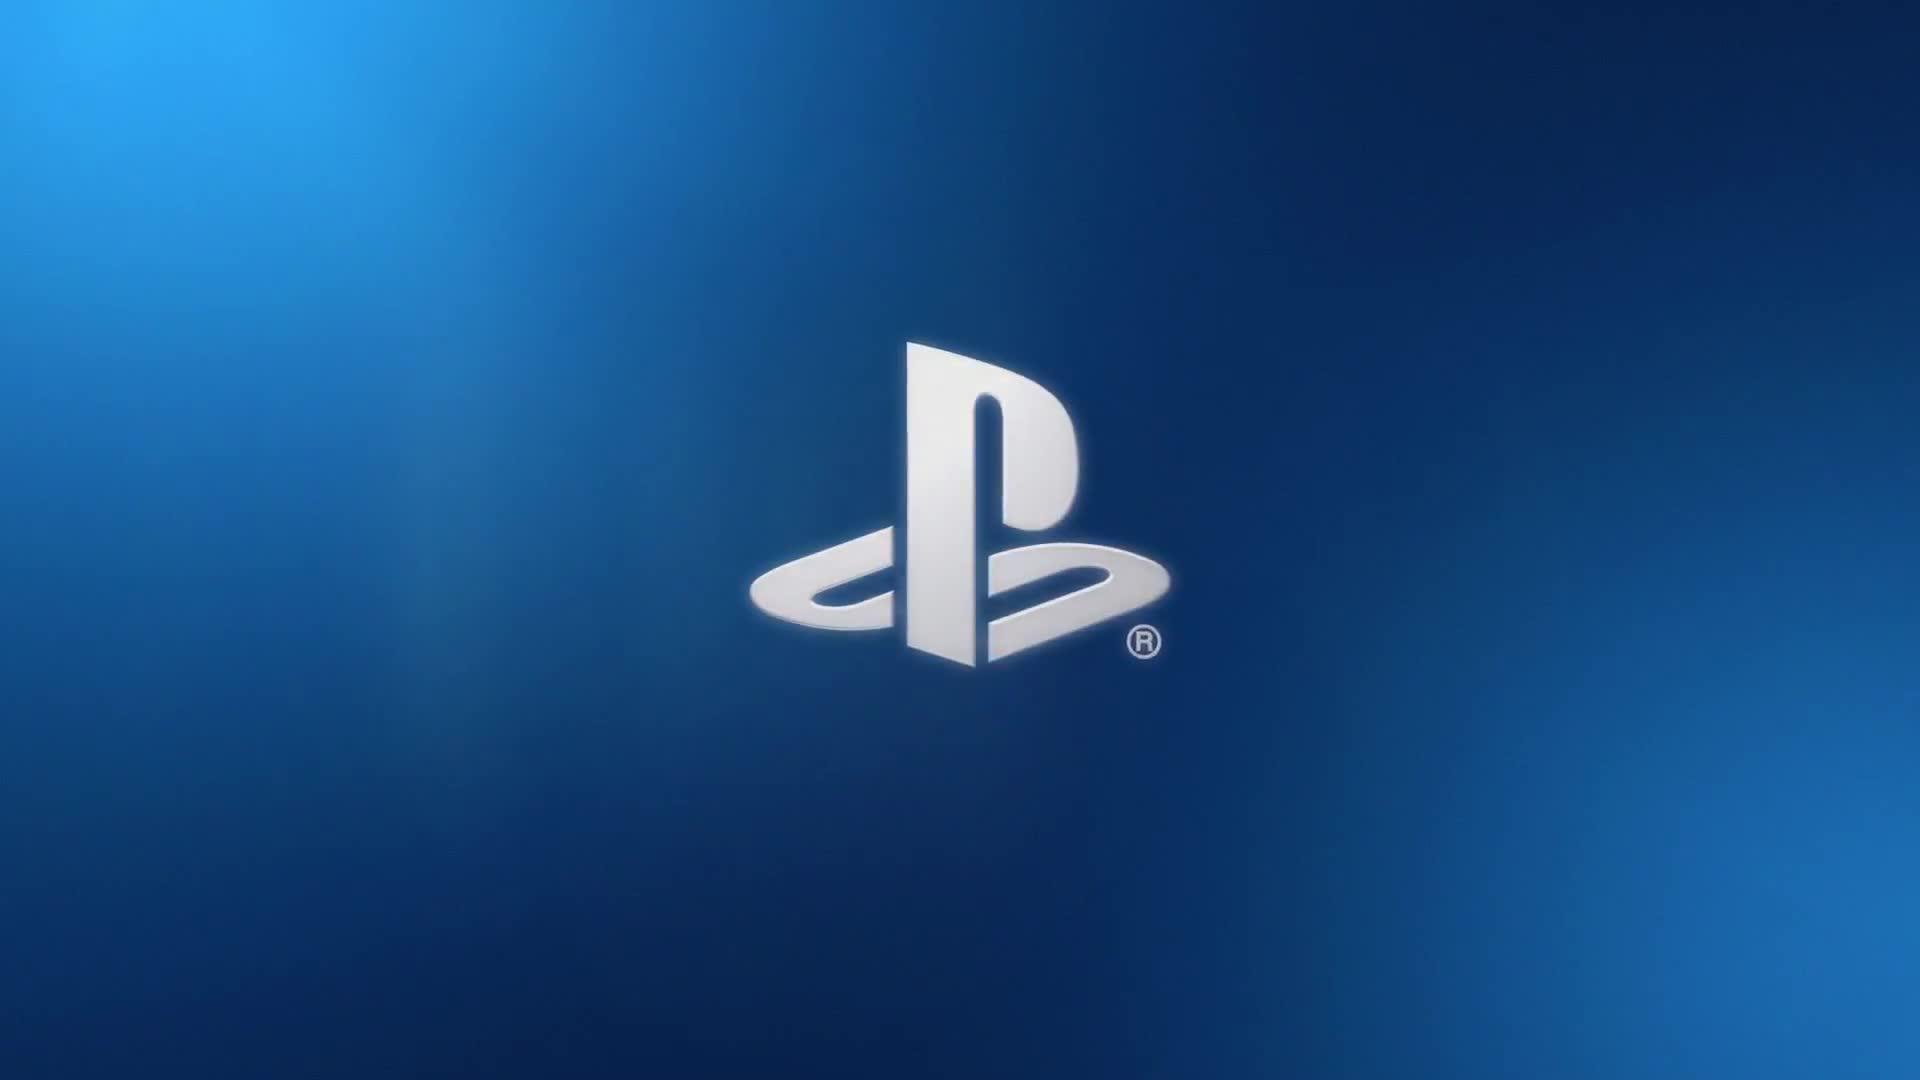 Playstation logo wallpaper wallpapersafari - Wallpapers sites list ...